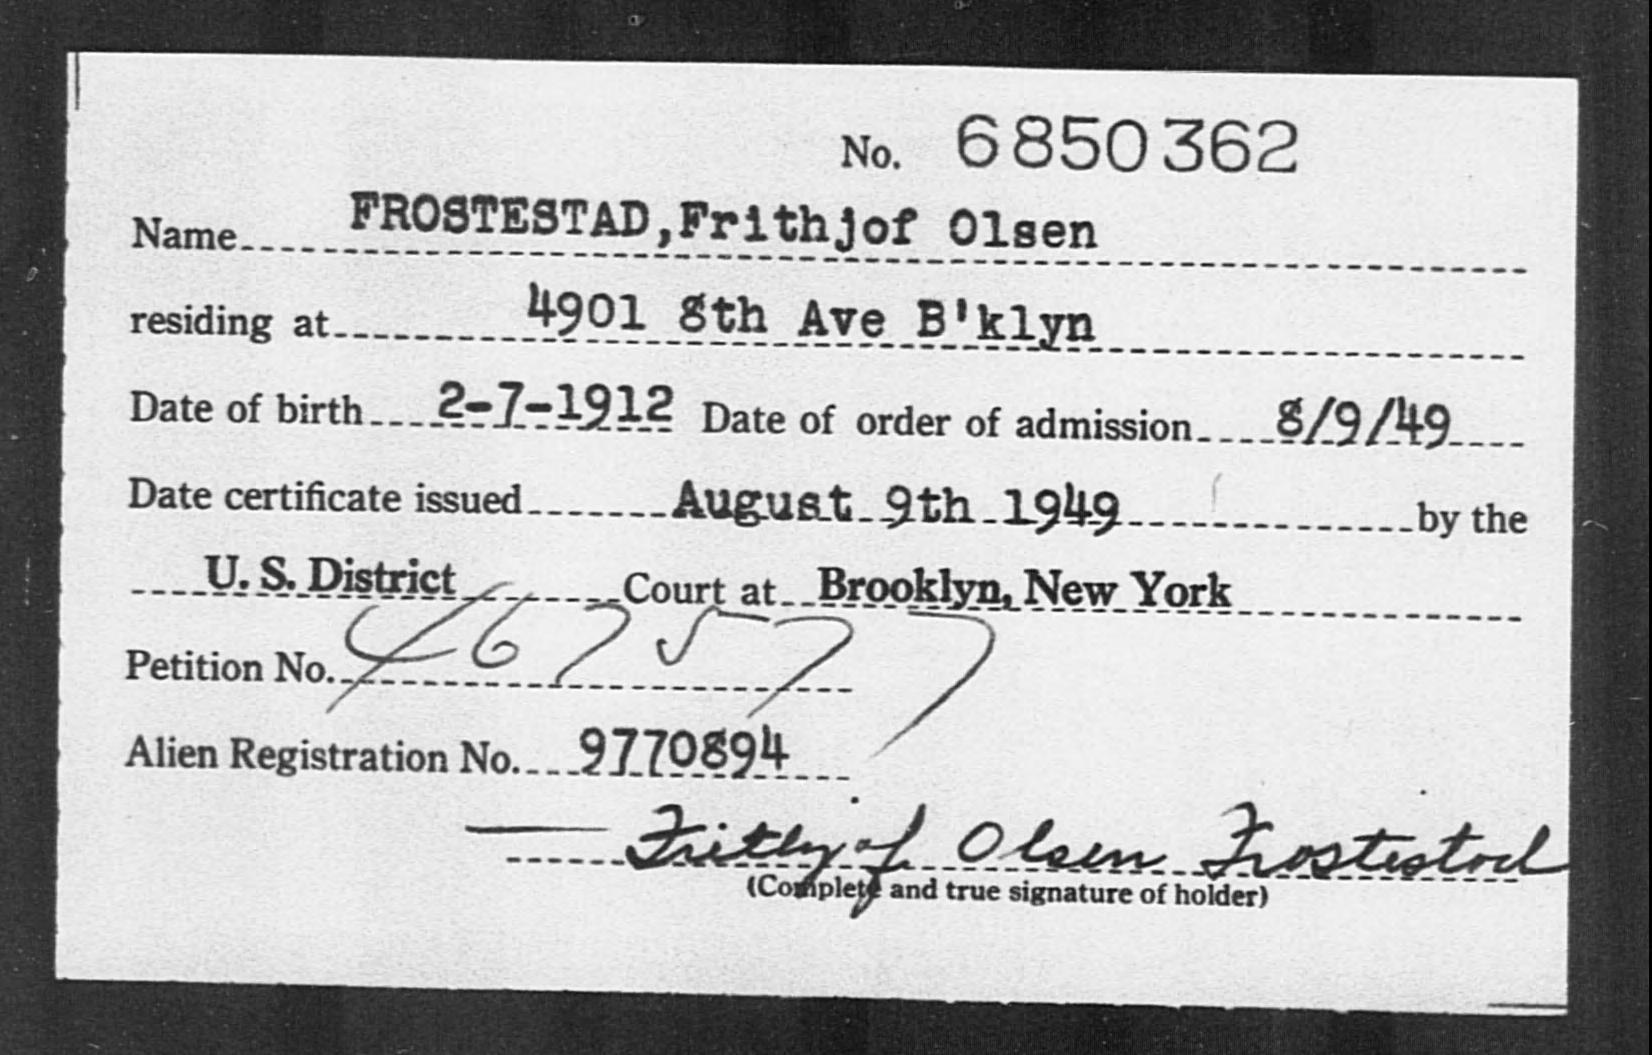 FROSTESTAD, Frithjof Olsen - Born: 1912, Naturalized: 1949